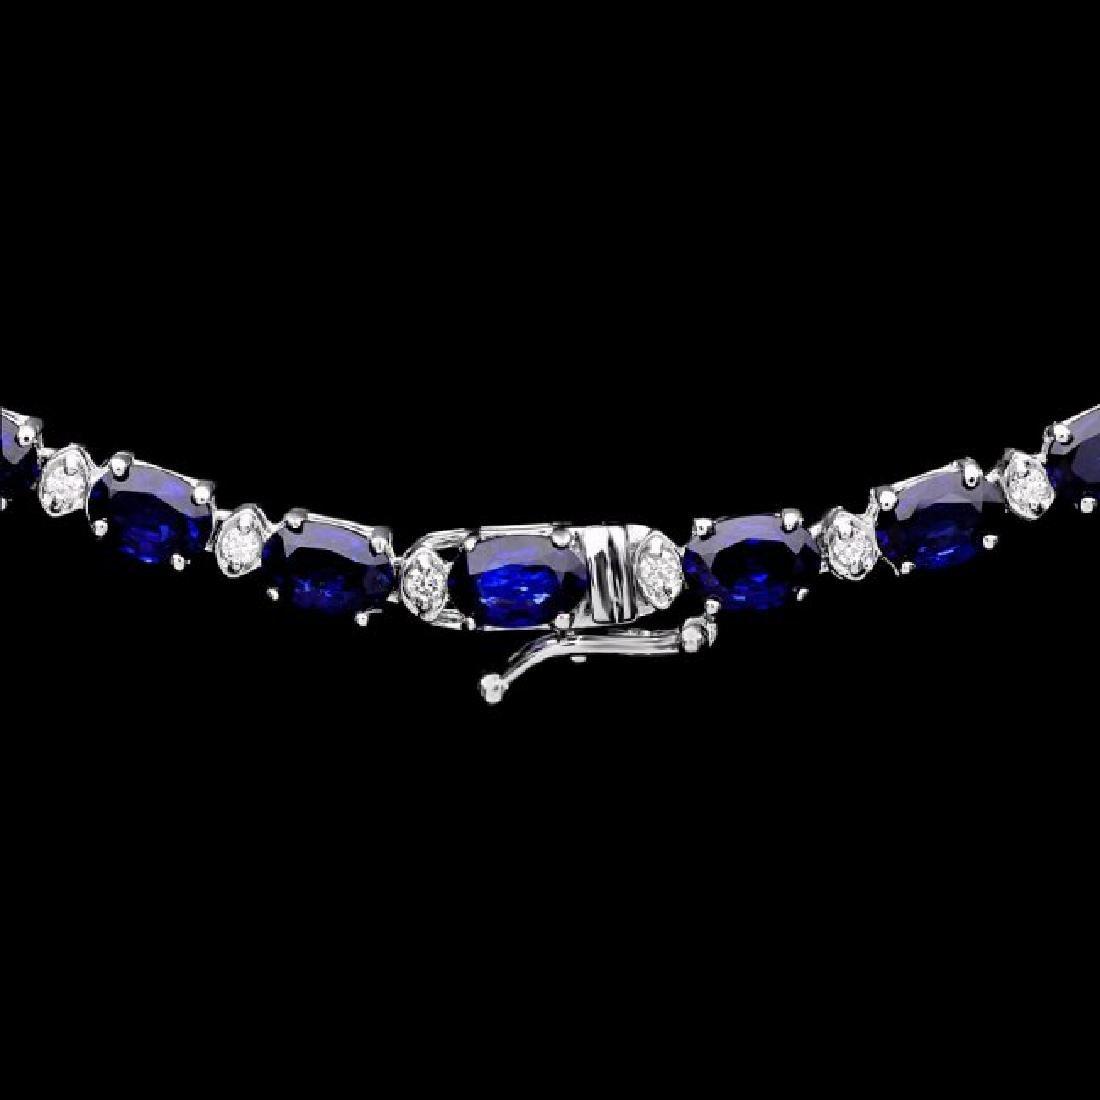 14k Gold 30ct Sapphire 1.10ct Diamond Necklace - 3